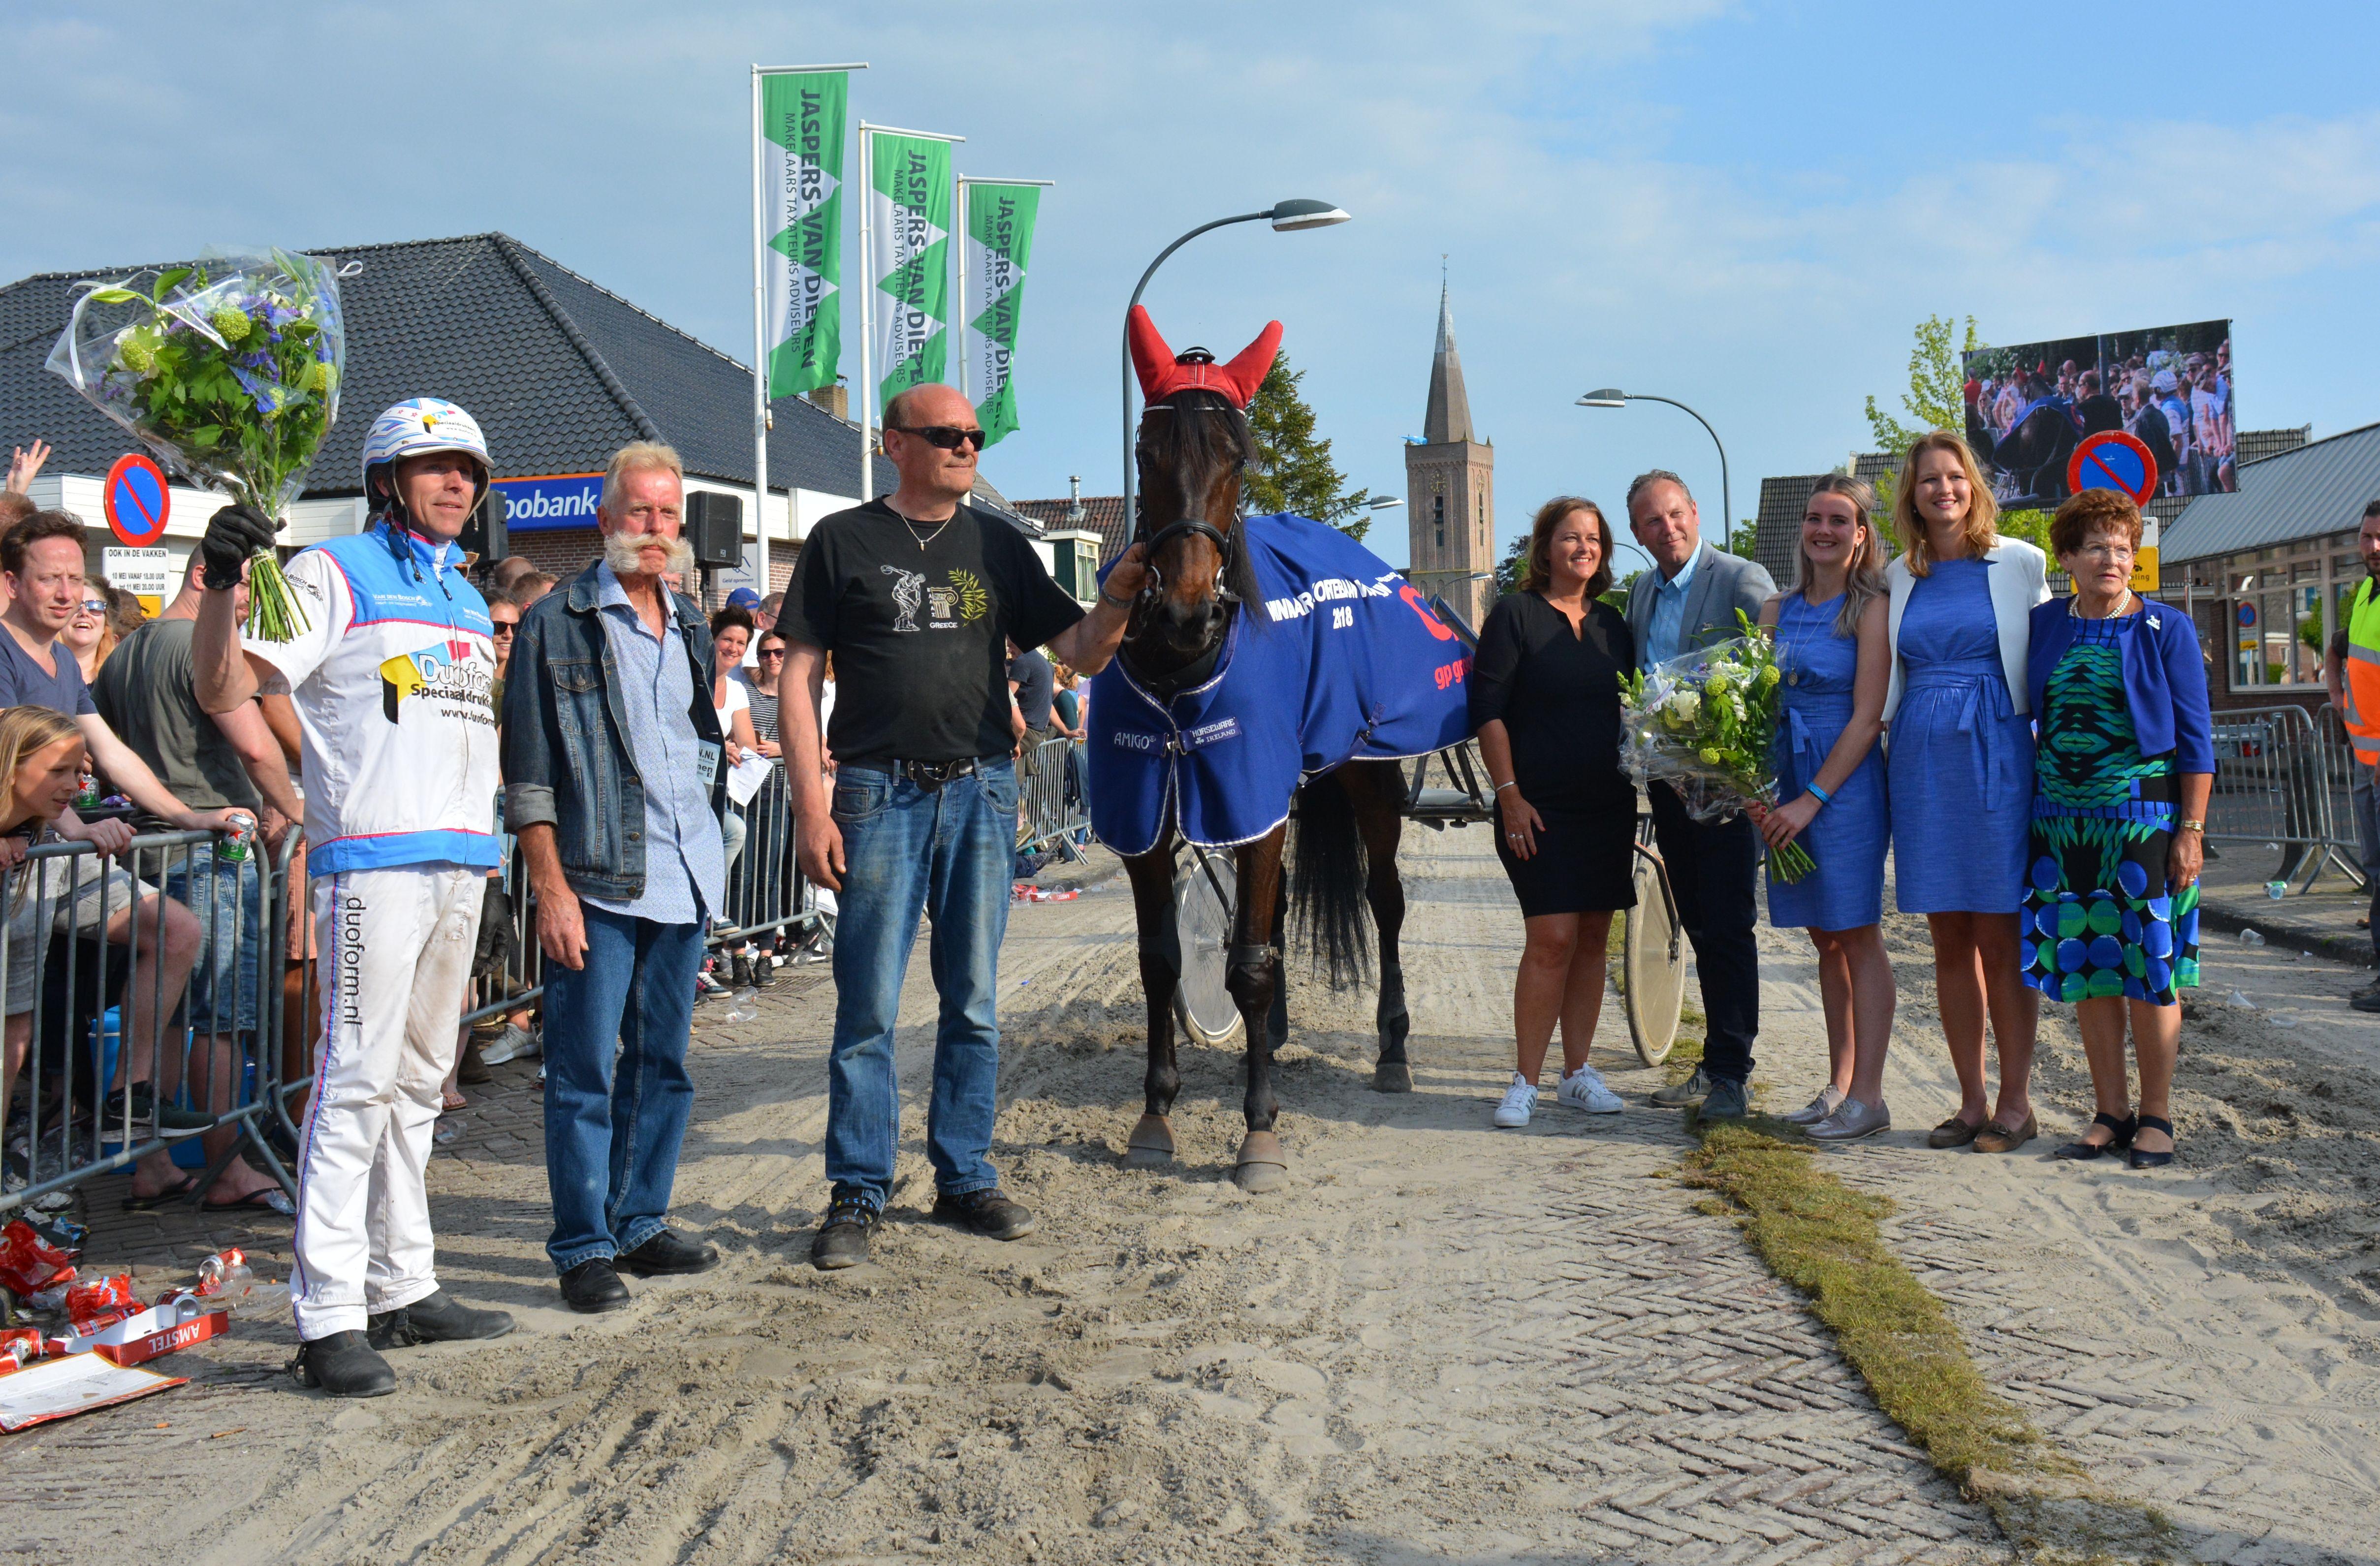 Cattiva Byd en John Dekker (l) gaan als eerste over de finish. (Foto: aangeleverd) rodi.nl © rodi